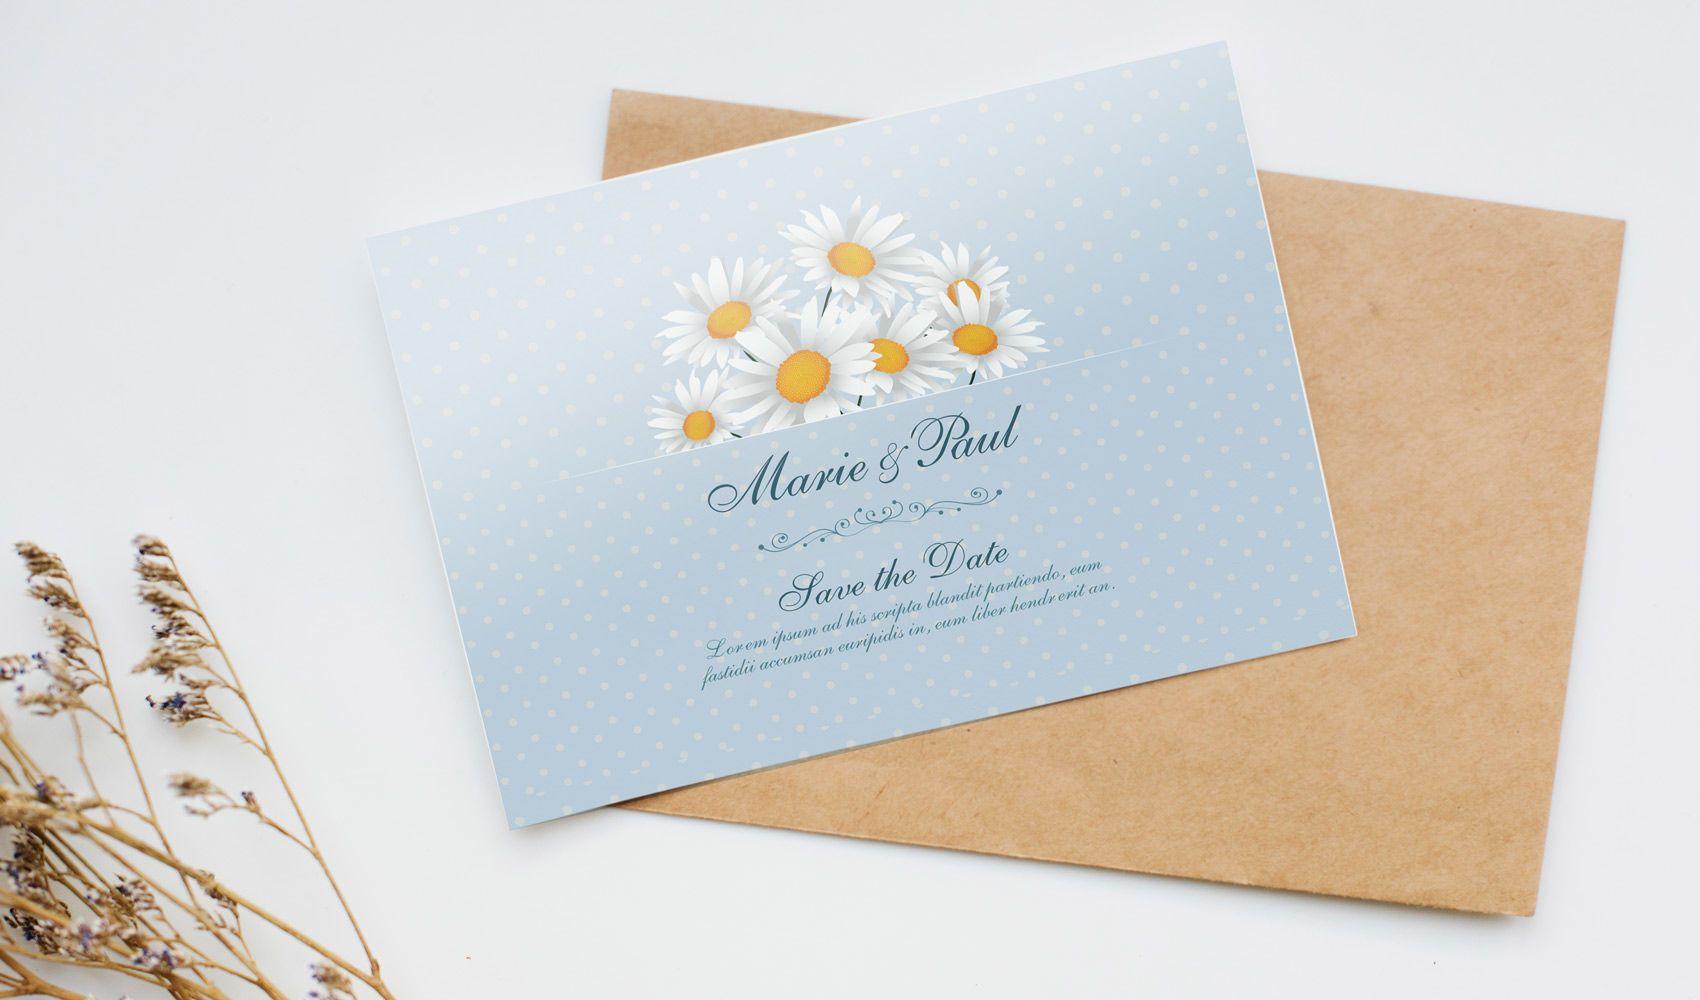 Tarjeta de invitaci?n con insignia floral